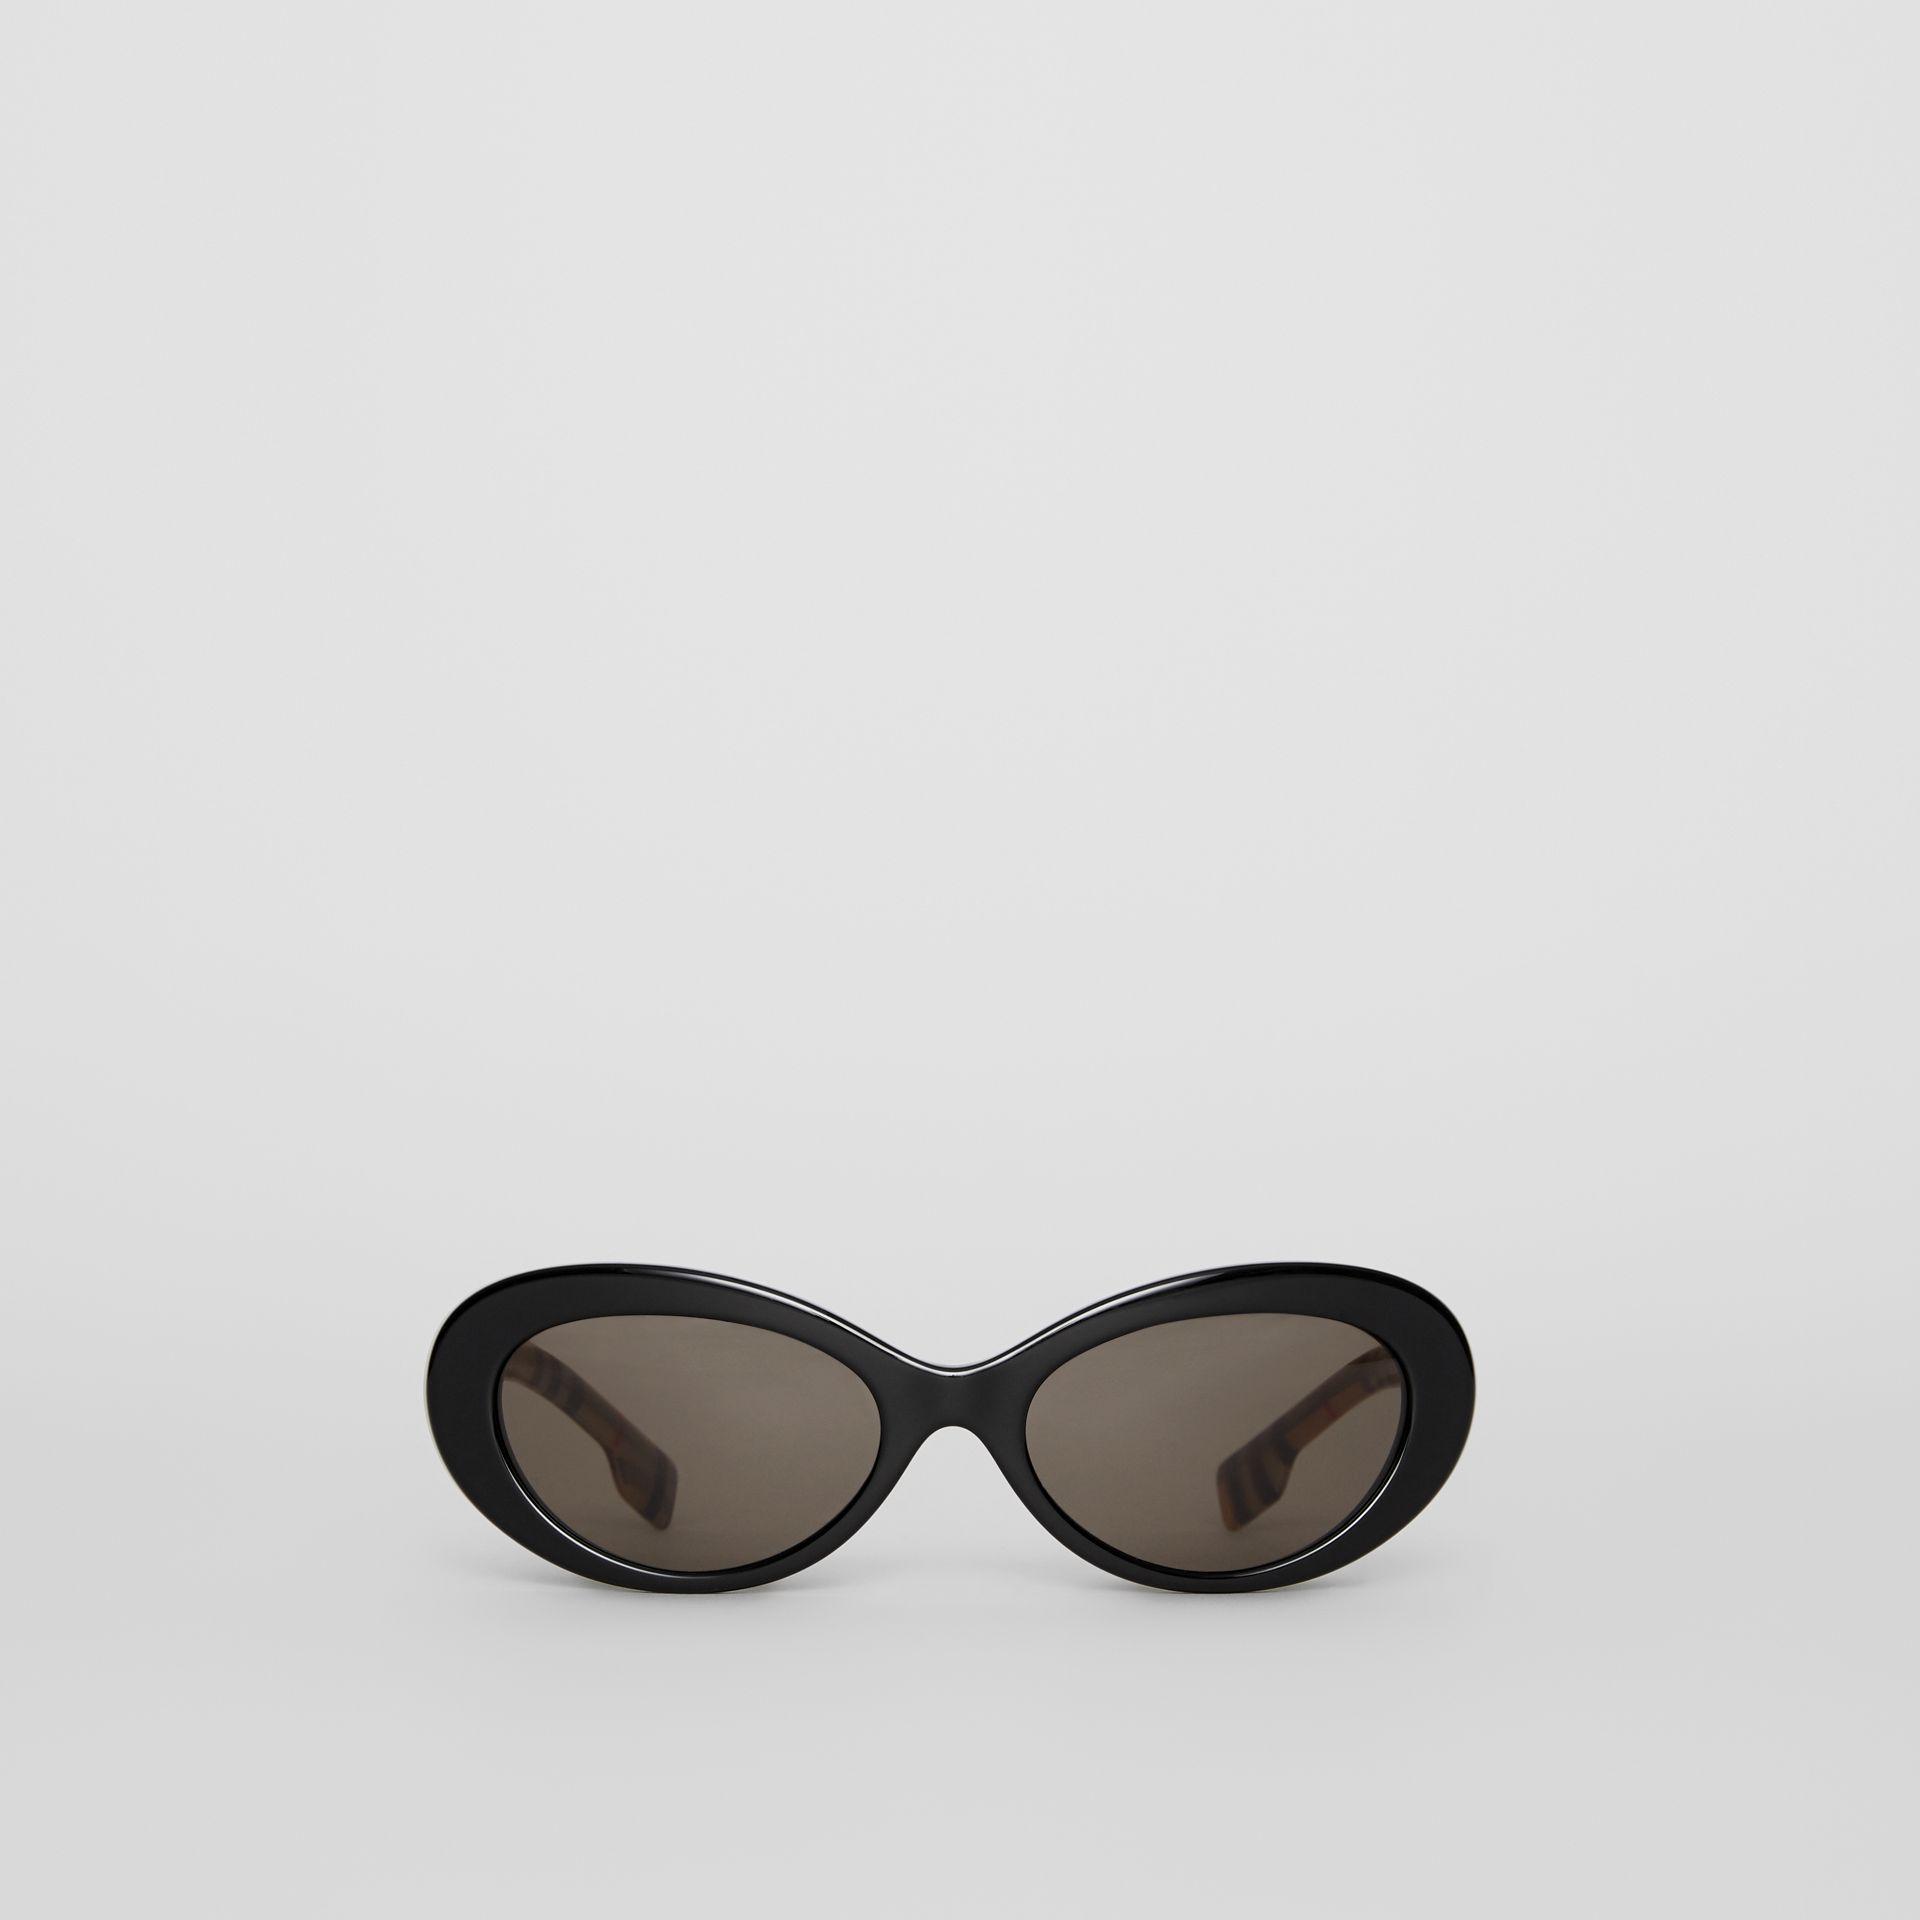 46804d2e4035 Lyst - Burberry Vintage Check Detail Cat-eye Frame Sunglasses in Black